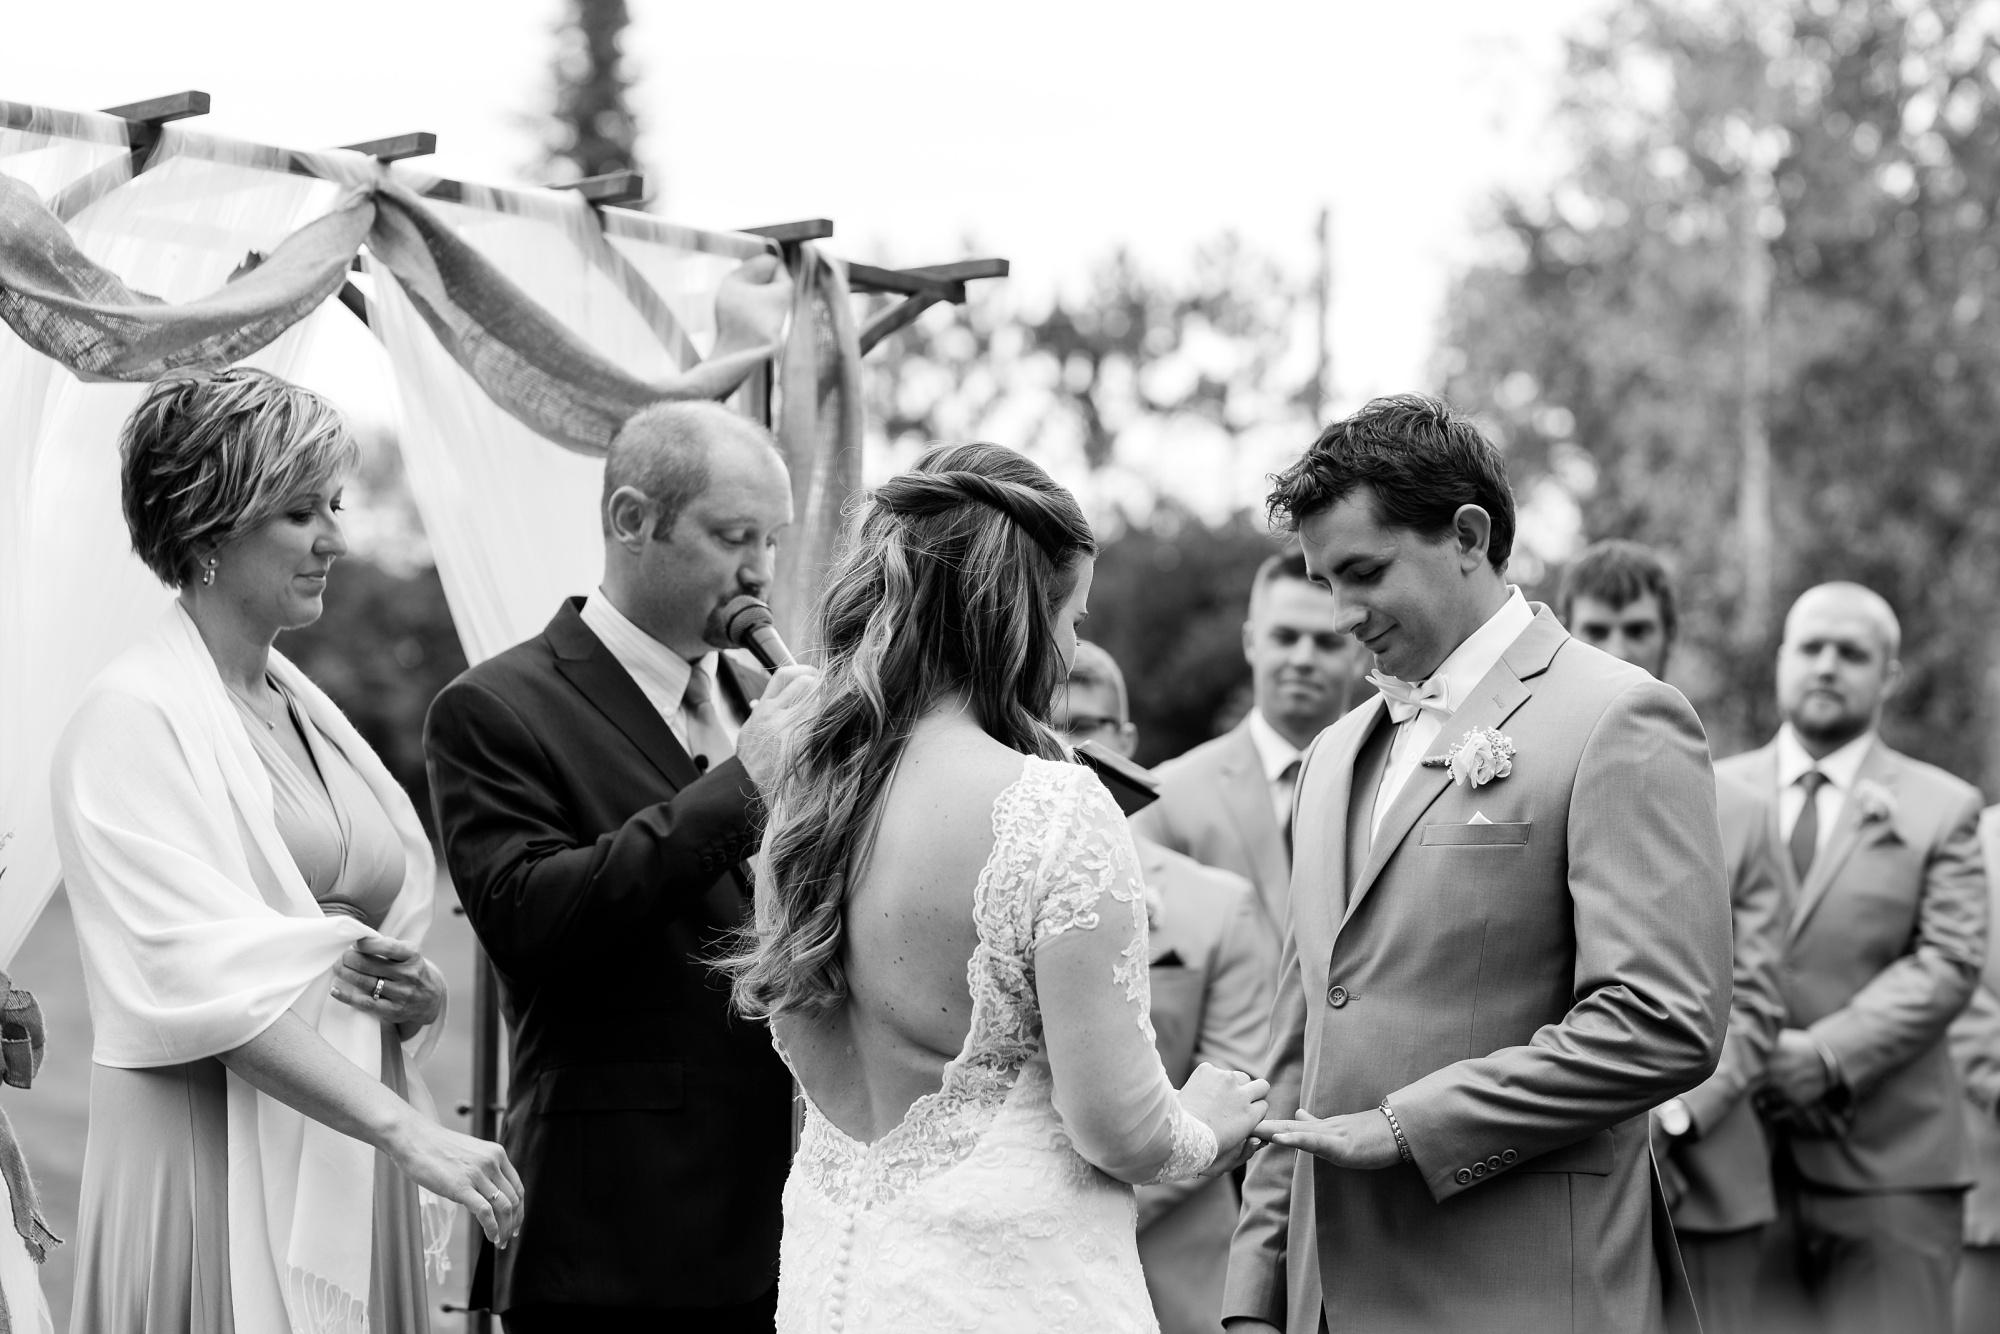 AmberLangerudPhotography_Fair Hills Resort Lakeside Wedding in Minnesota_3467.jpg